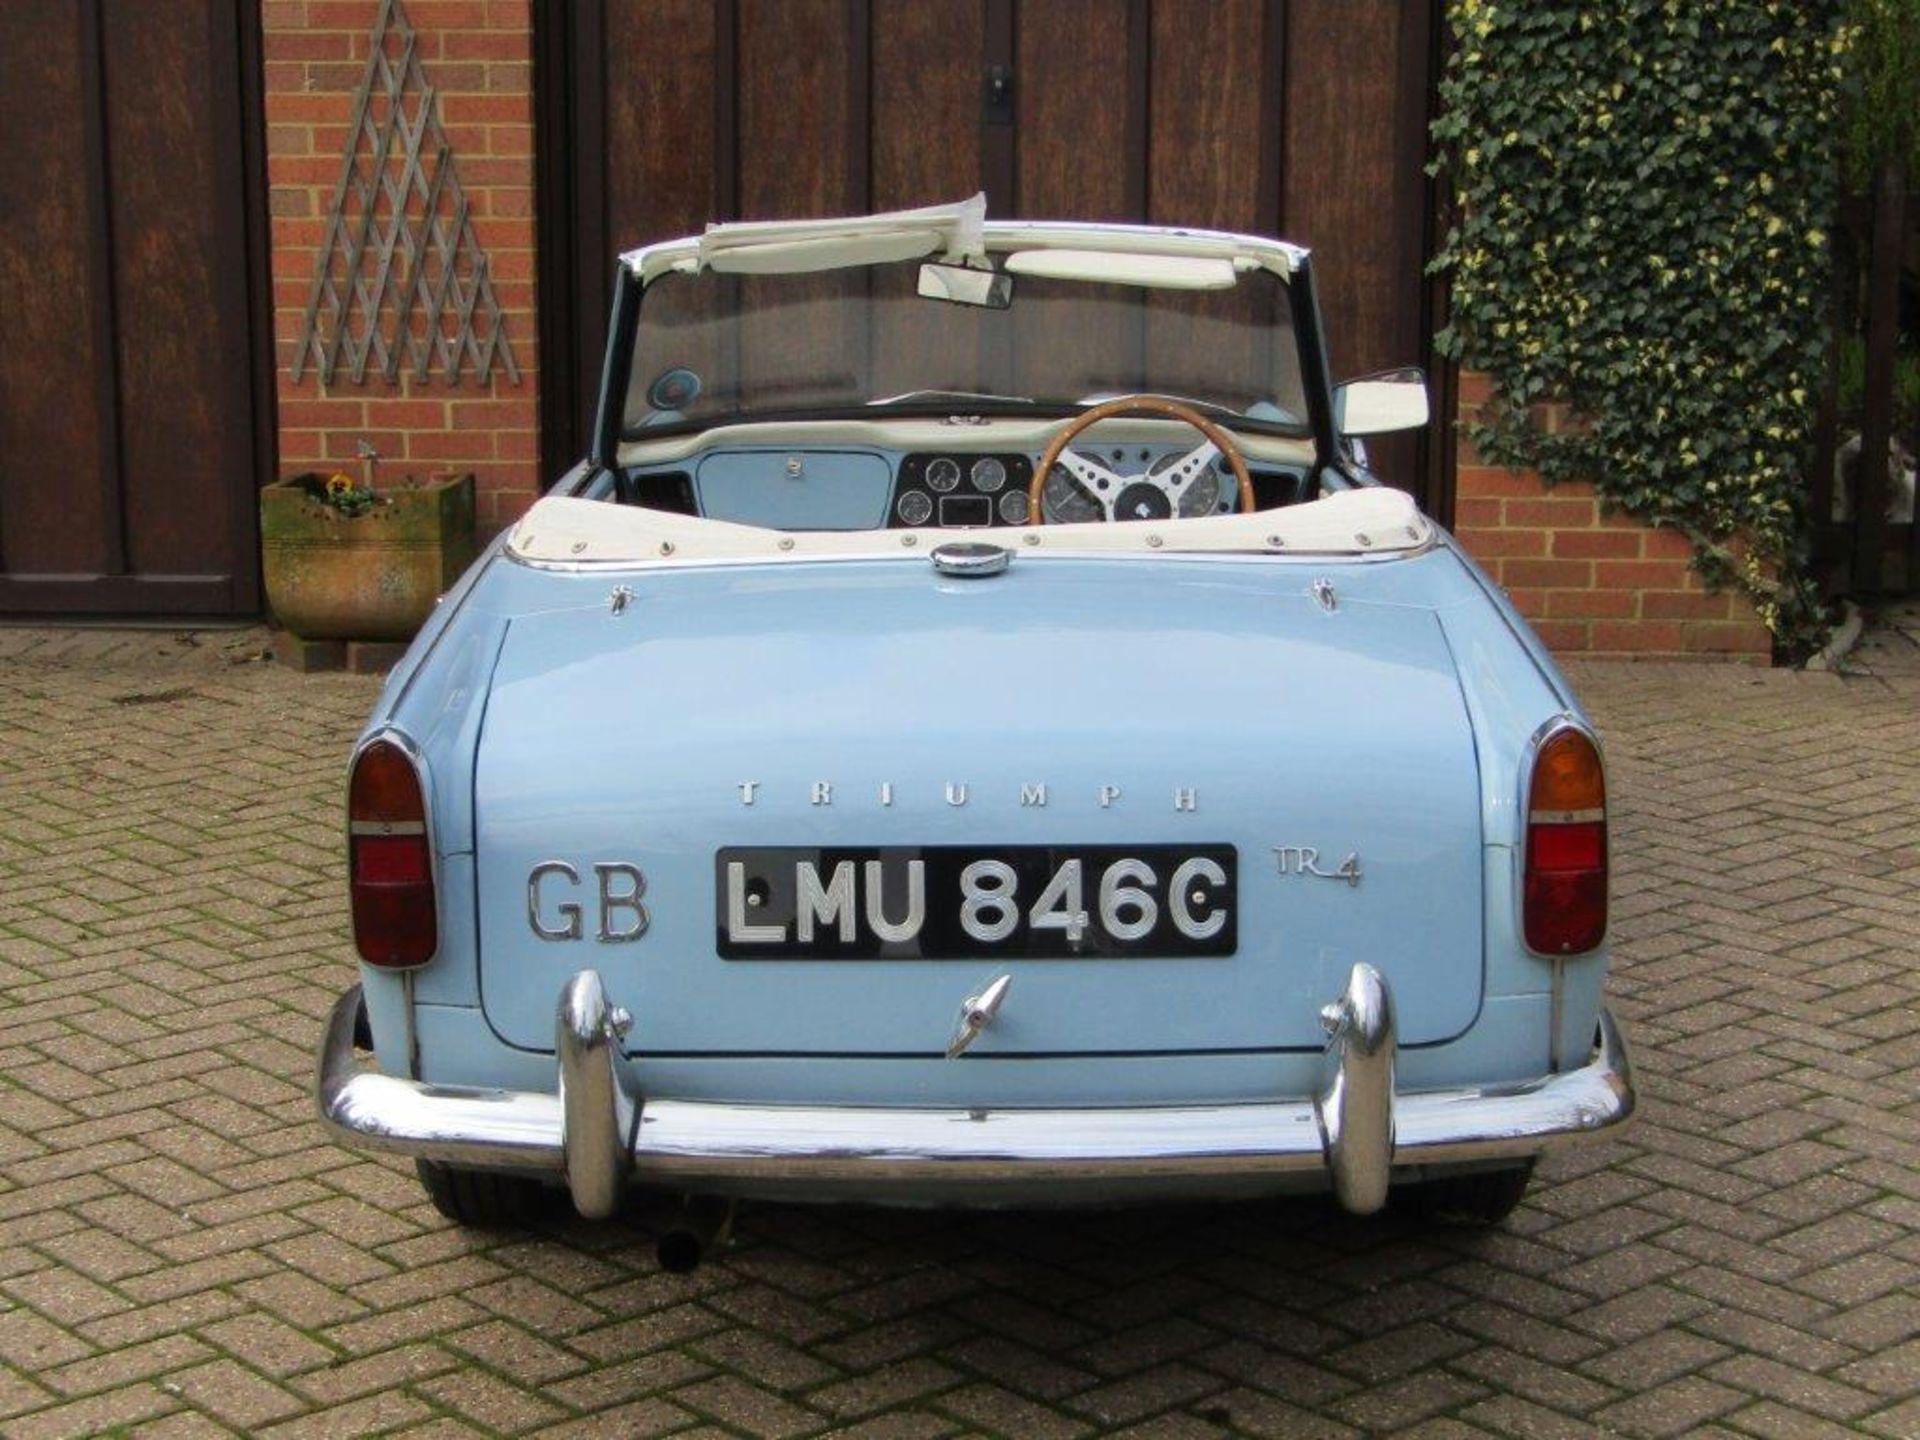 1965 Triumph TR4 - Image 6 of 17